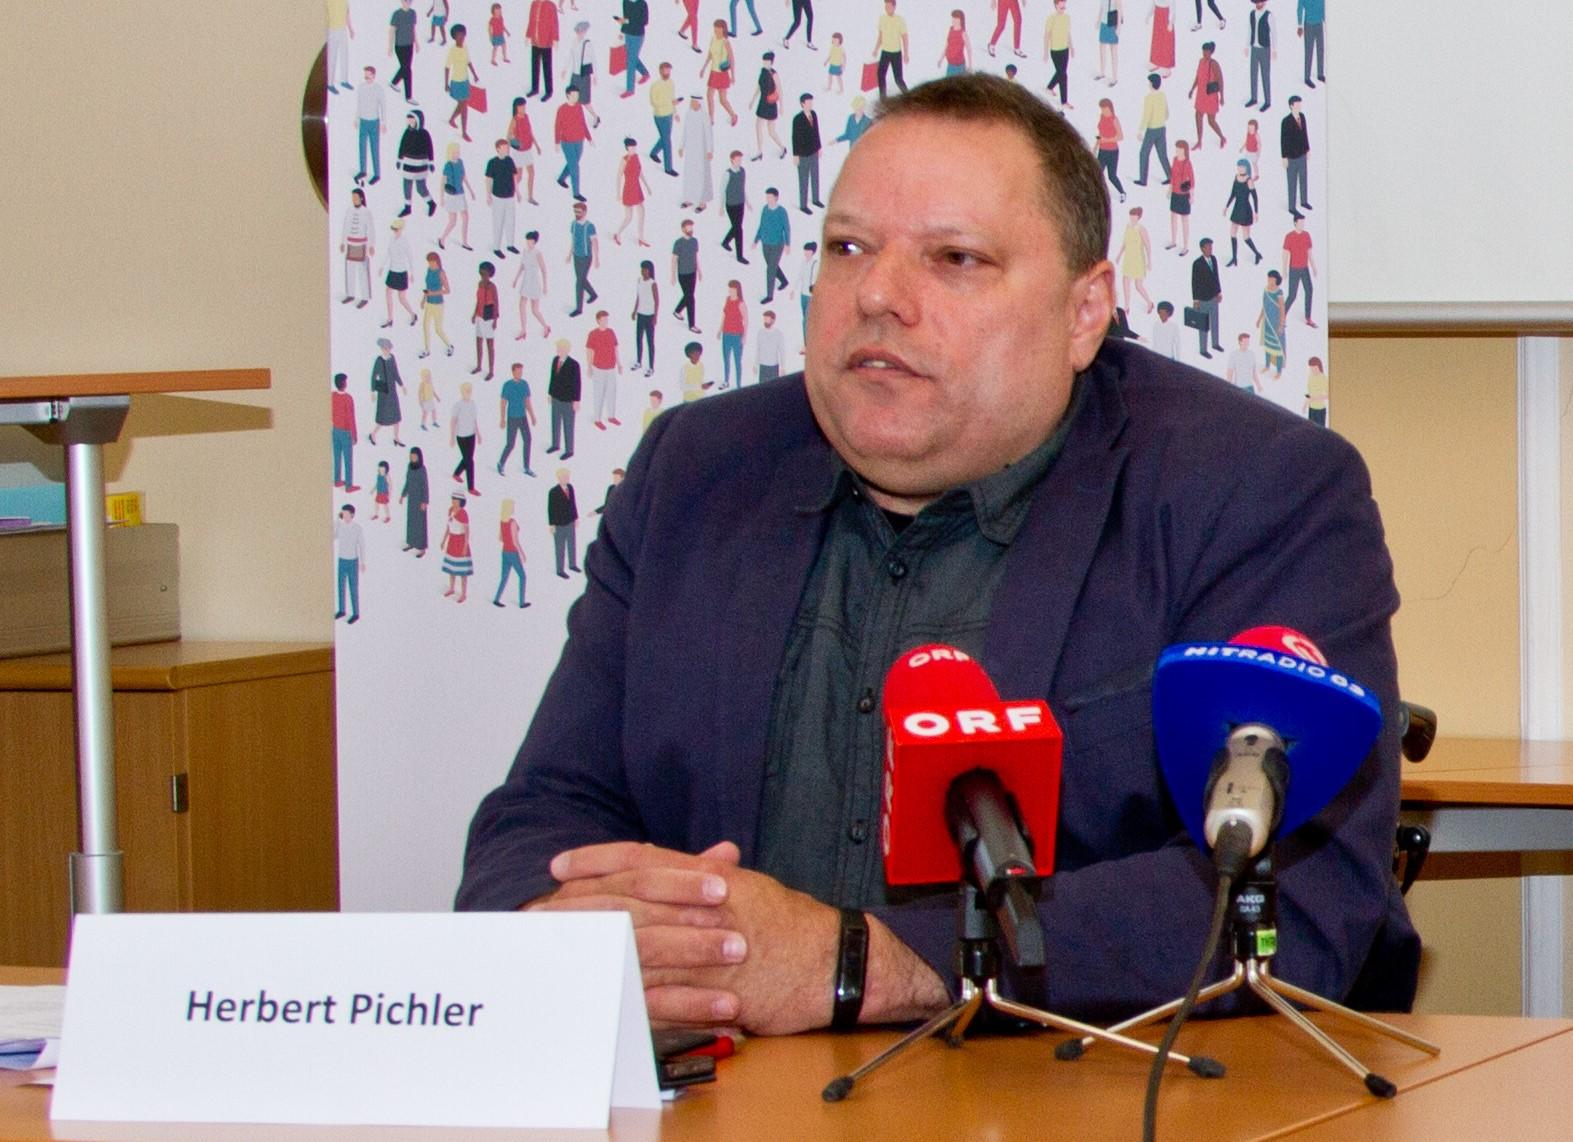 Behindertenrat-Prsident Herbert Pichler, Foto: Behindertenrat/Michael Janousek